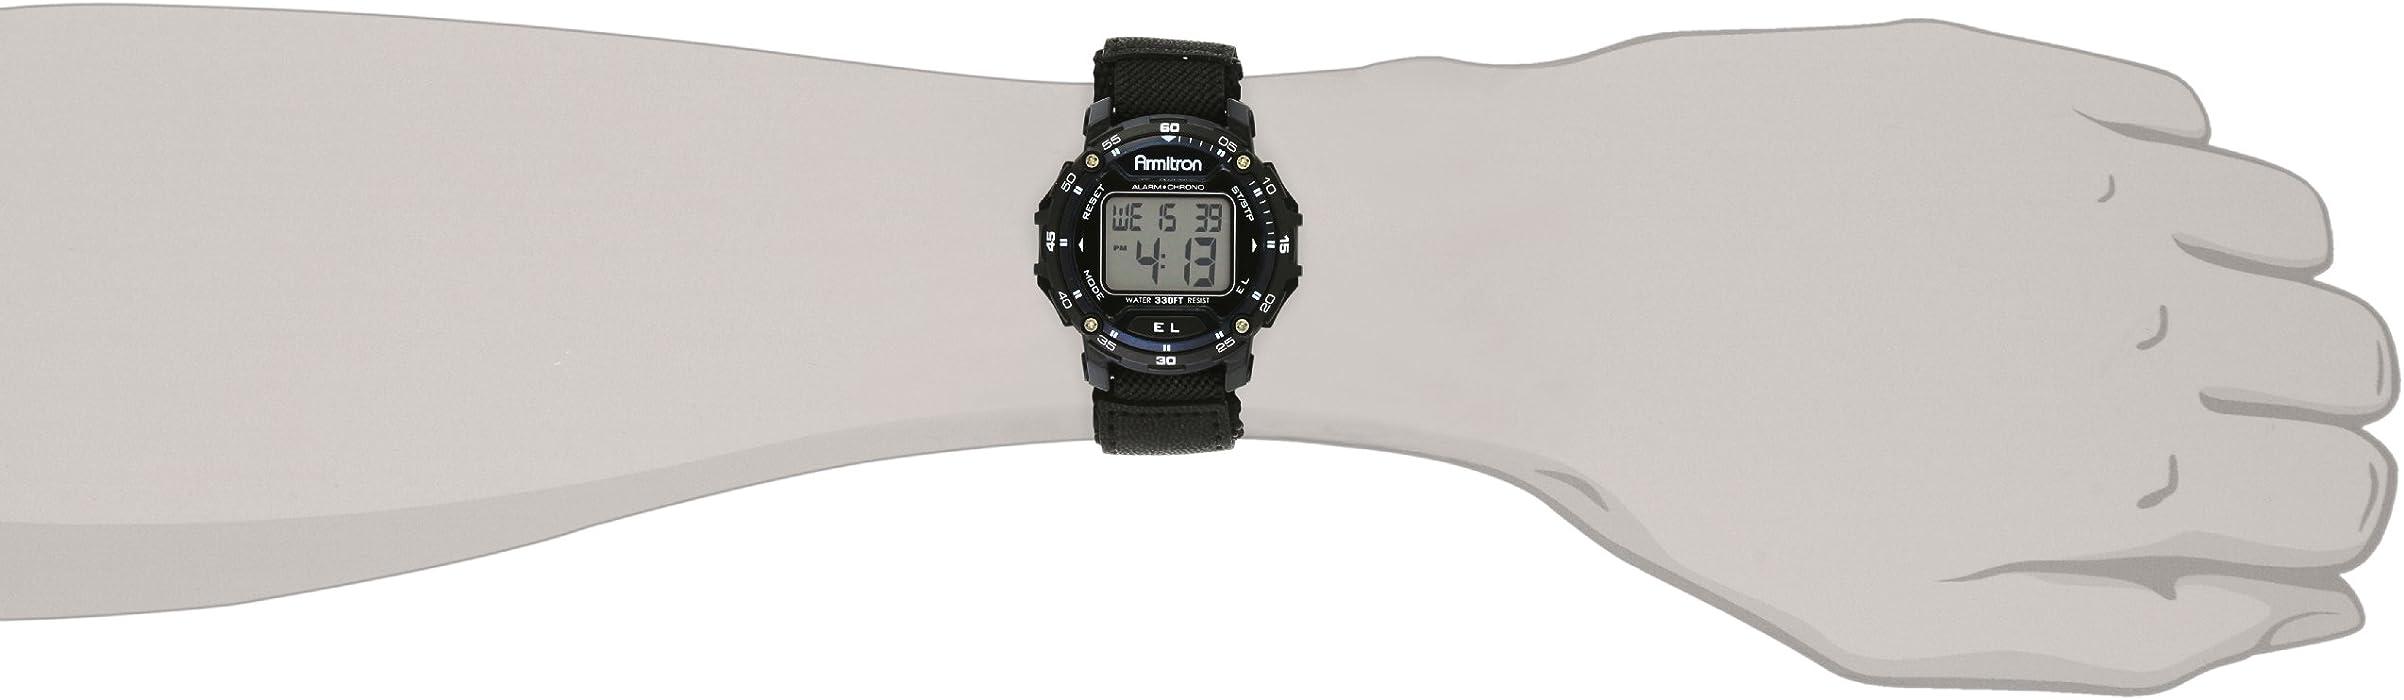 Armitron Sport Unisex 408291BLU Navy Blue Accented Digital Chronograph Black Nylon Strap Watch